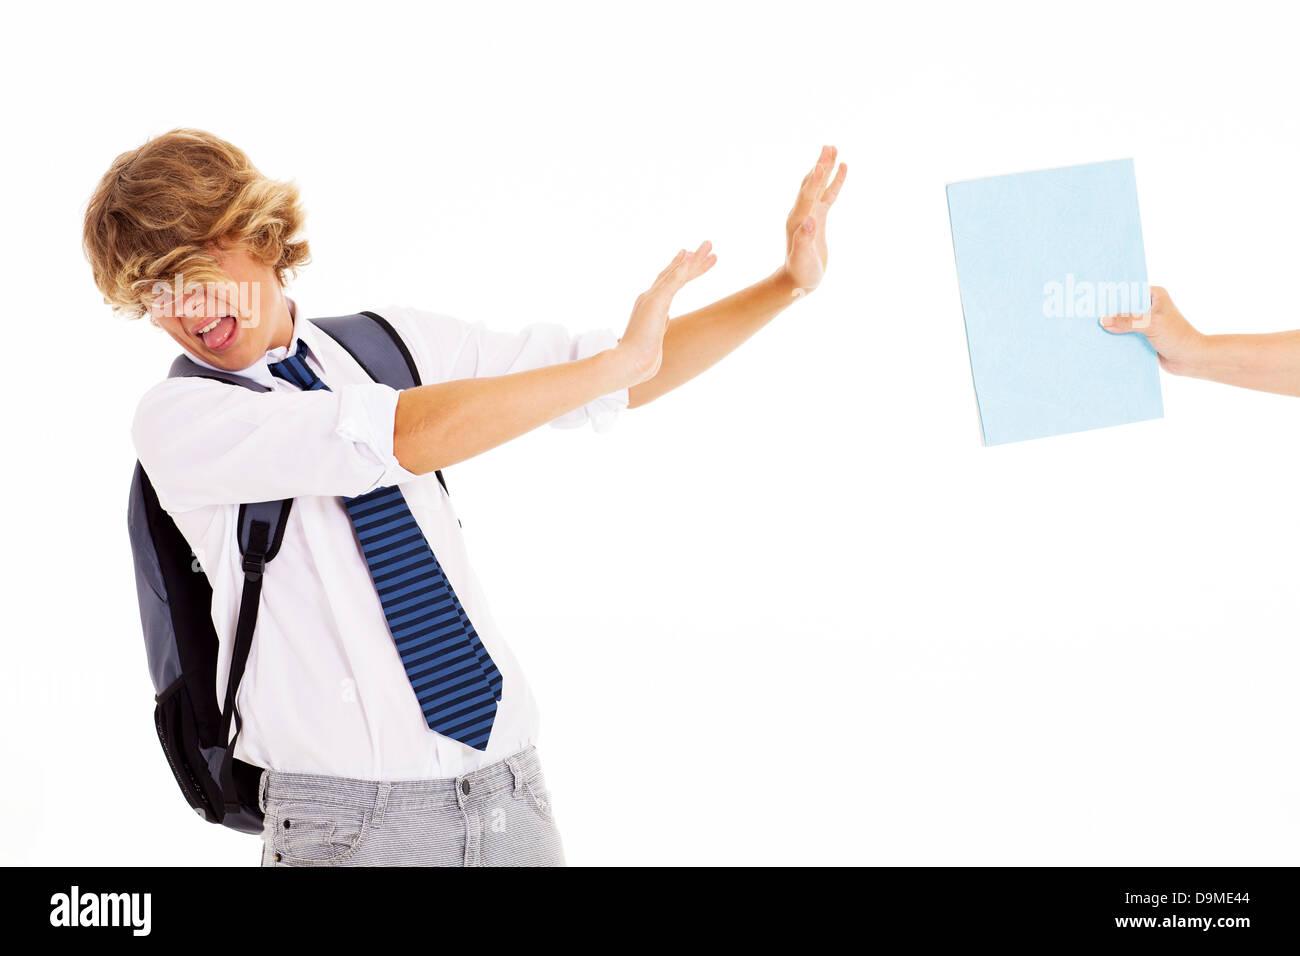 naughty teen student dislike and refuse to study - Stock Image